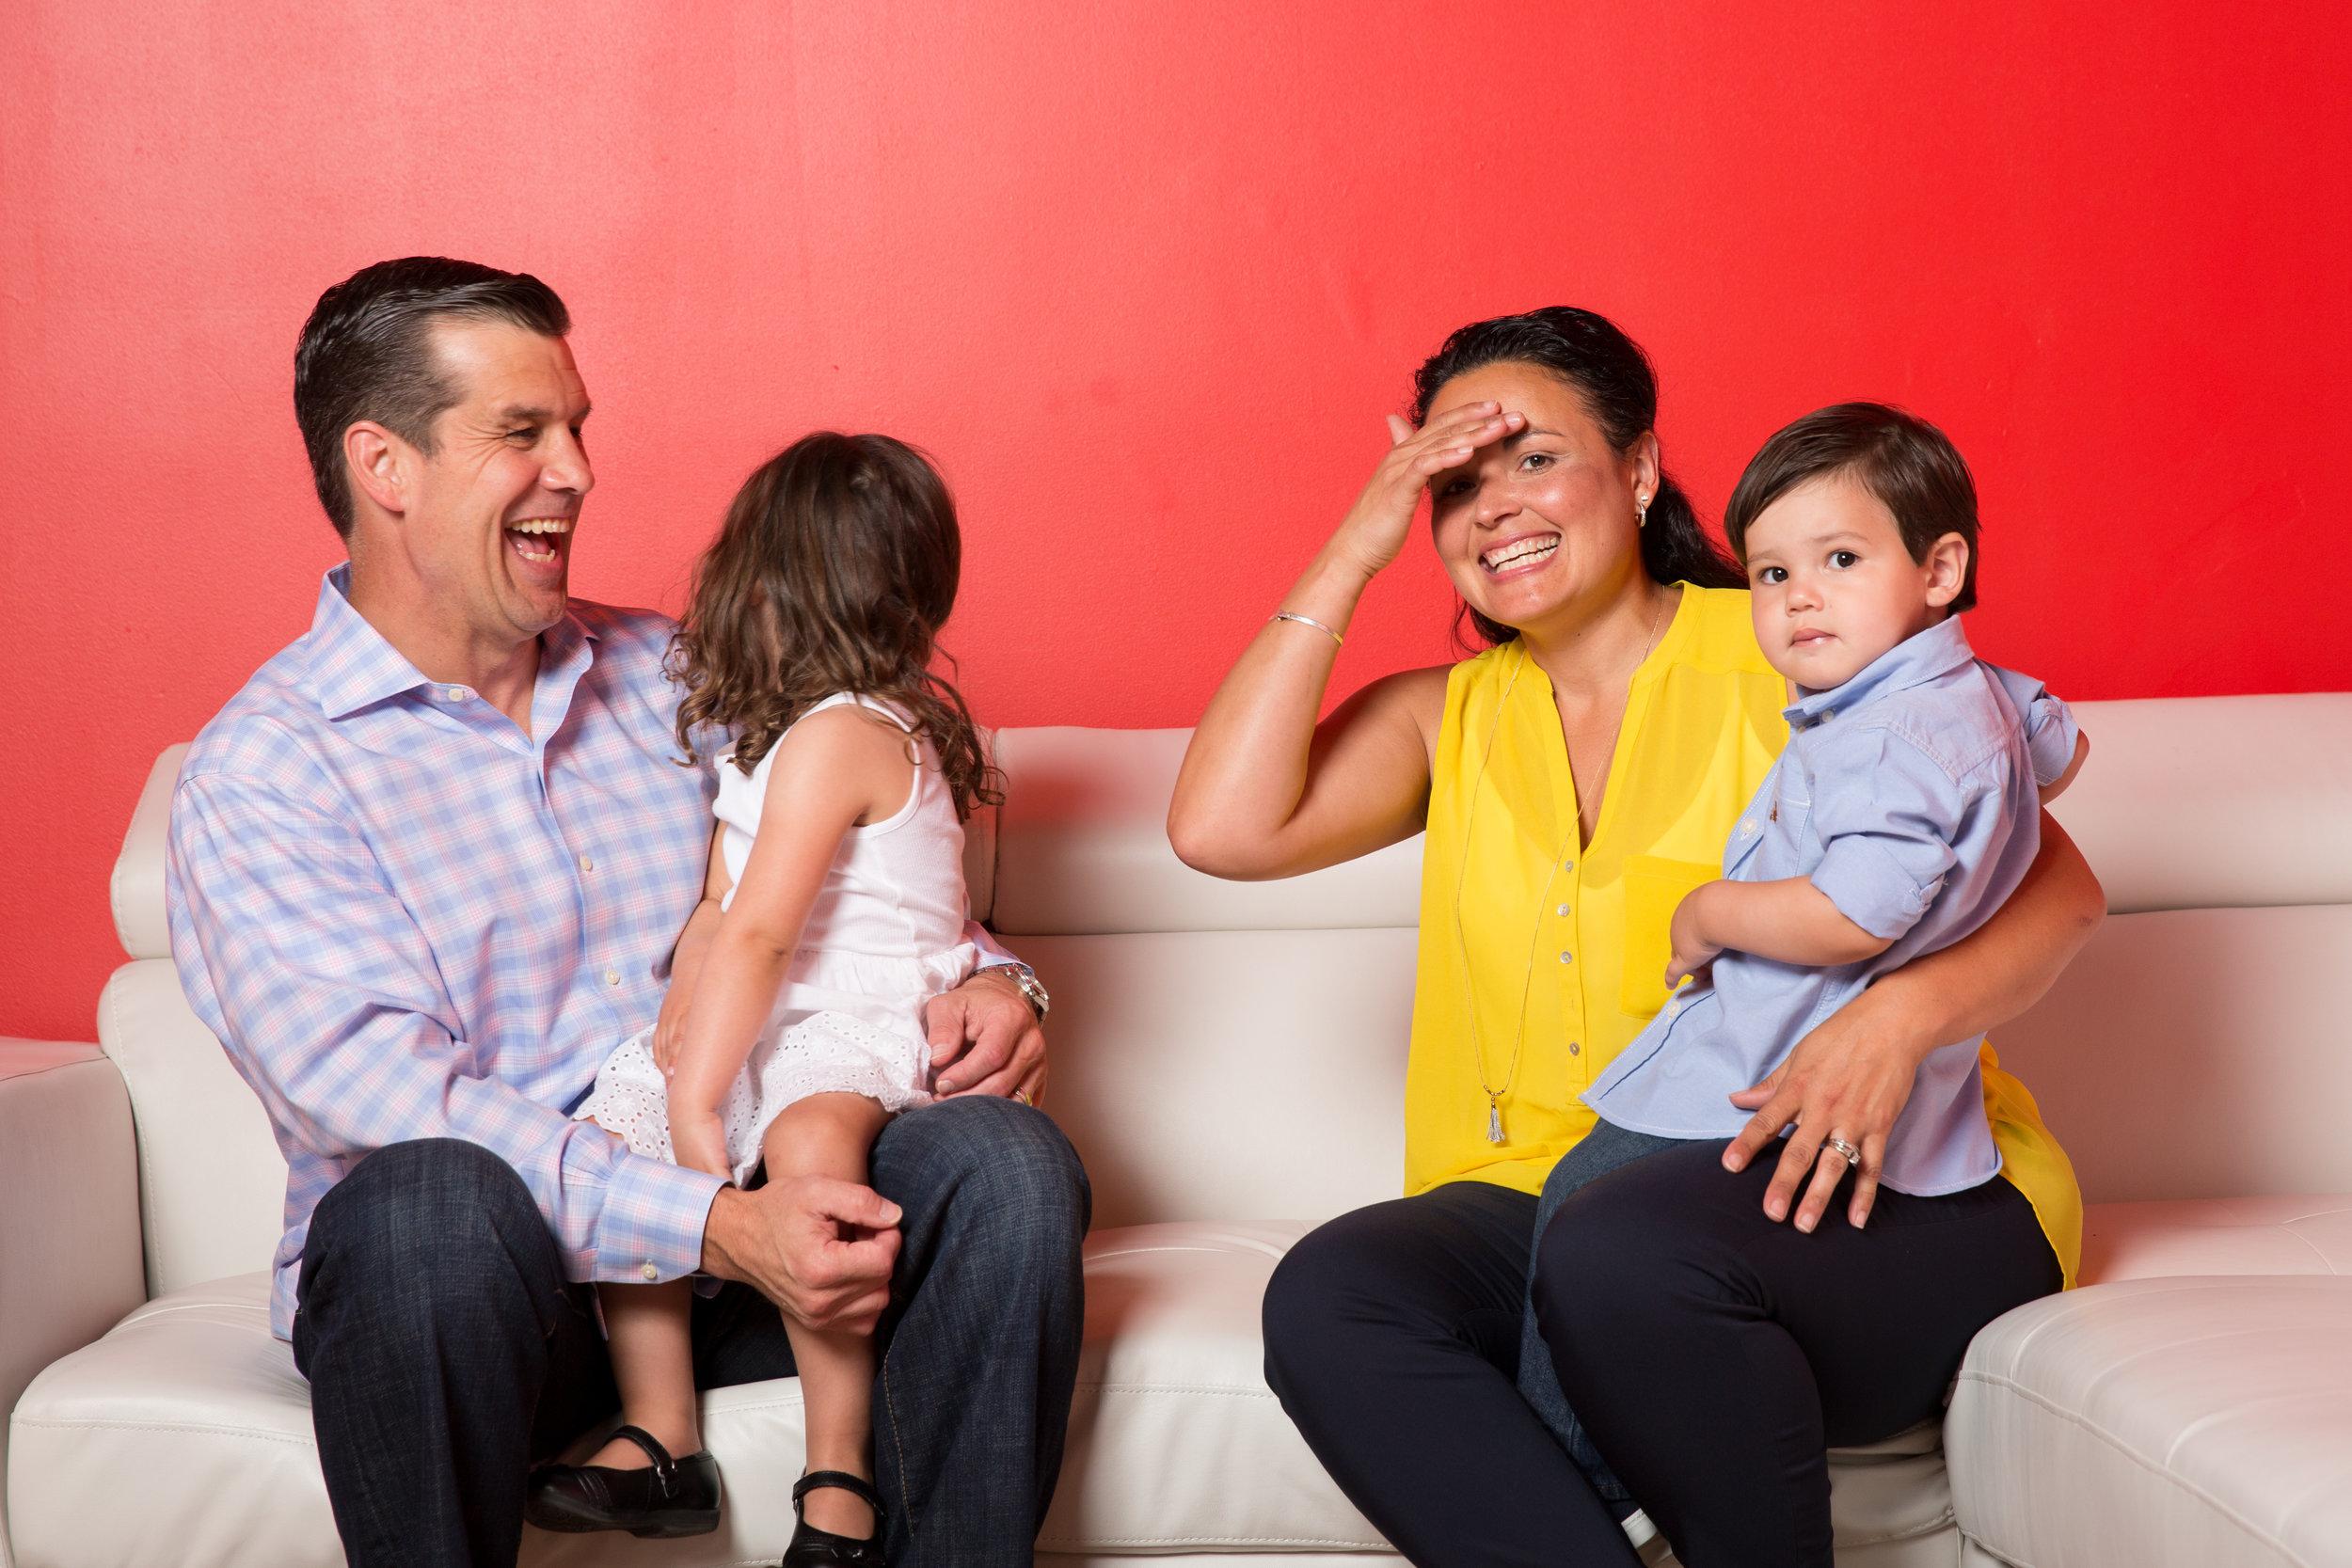 The Molitor Family - Ed, Nancy, Maddie, & EJ Molitor